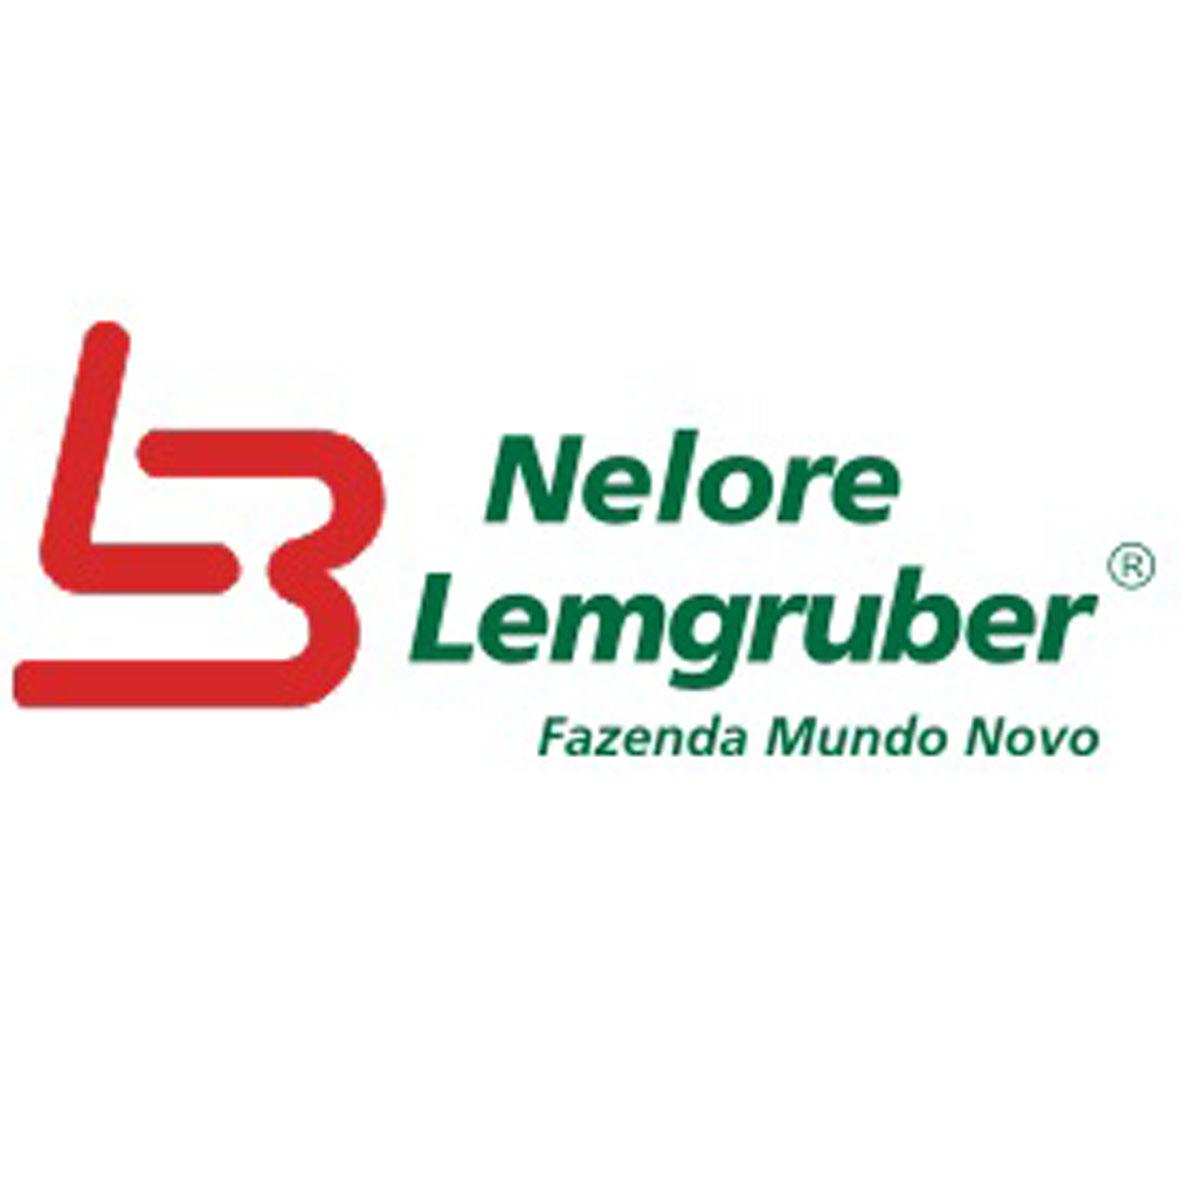 Nelore Lemgruber - Fazenda Mundo Novo